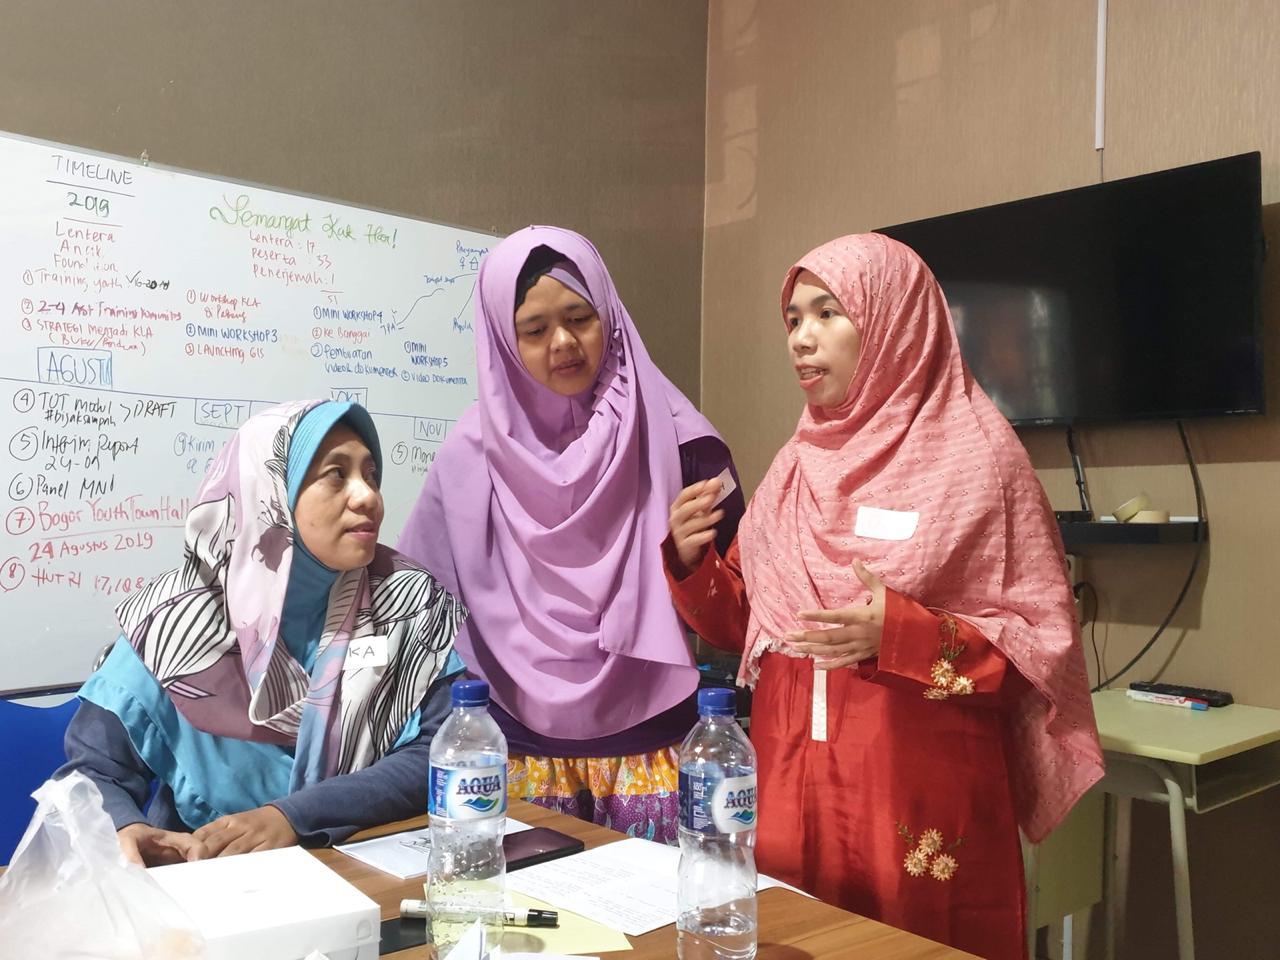 Jakarta Timur Usaha Meraih Kota Layak Anak